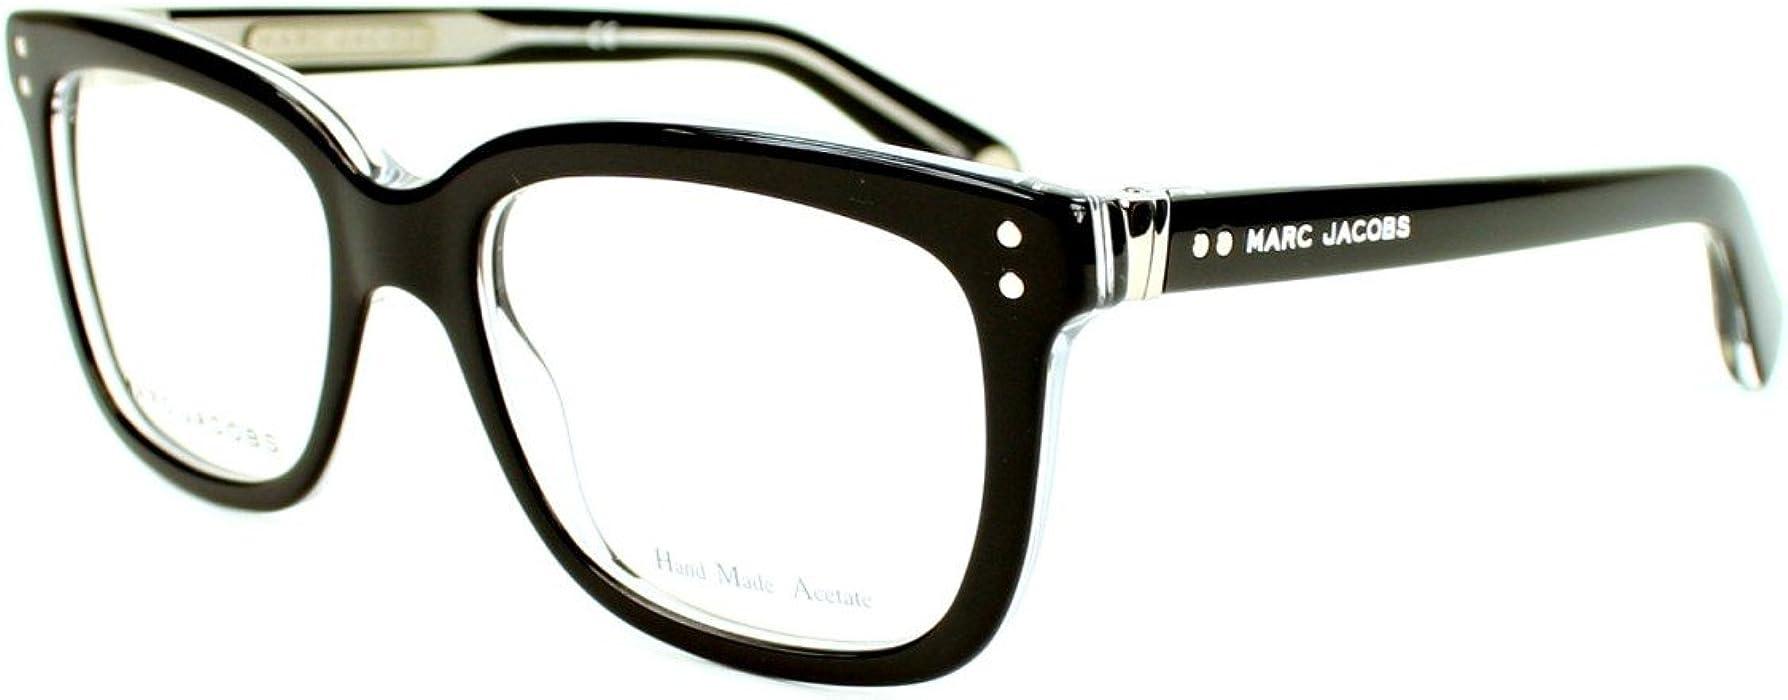 a2e4de2e0eb8 Marc Jacobs frame MJ 451 7C5 Acetate plastic Black crystal: Amazon.co.uk:  Clothing